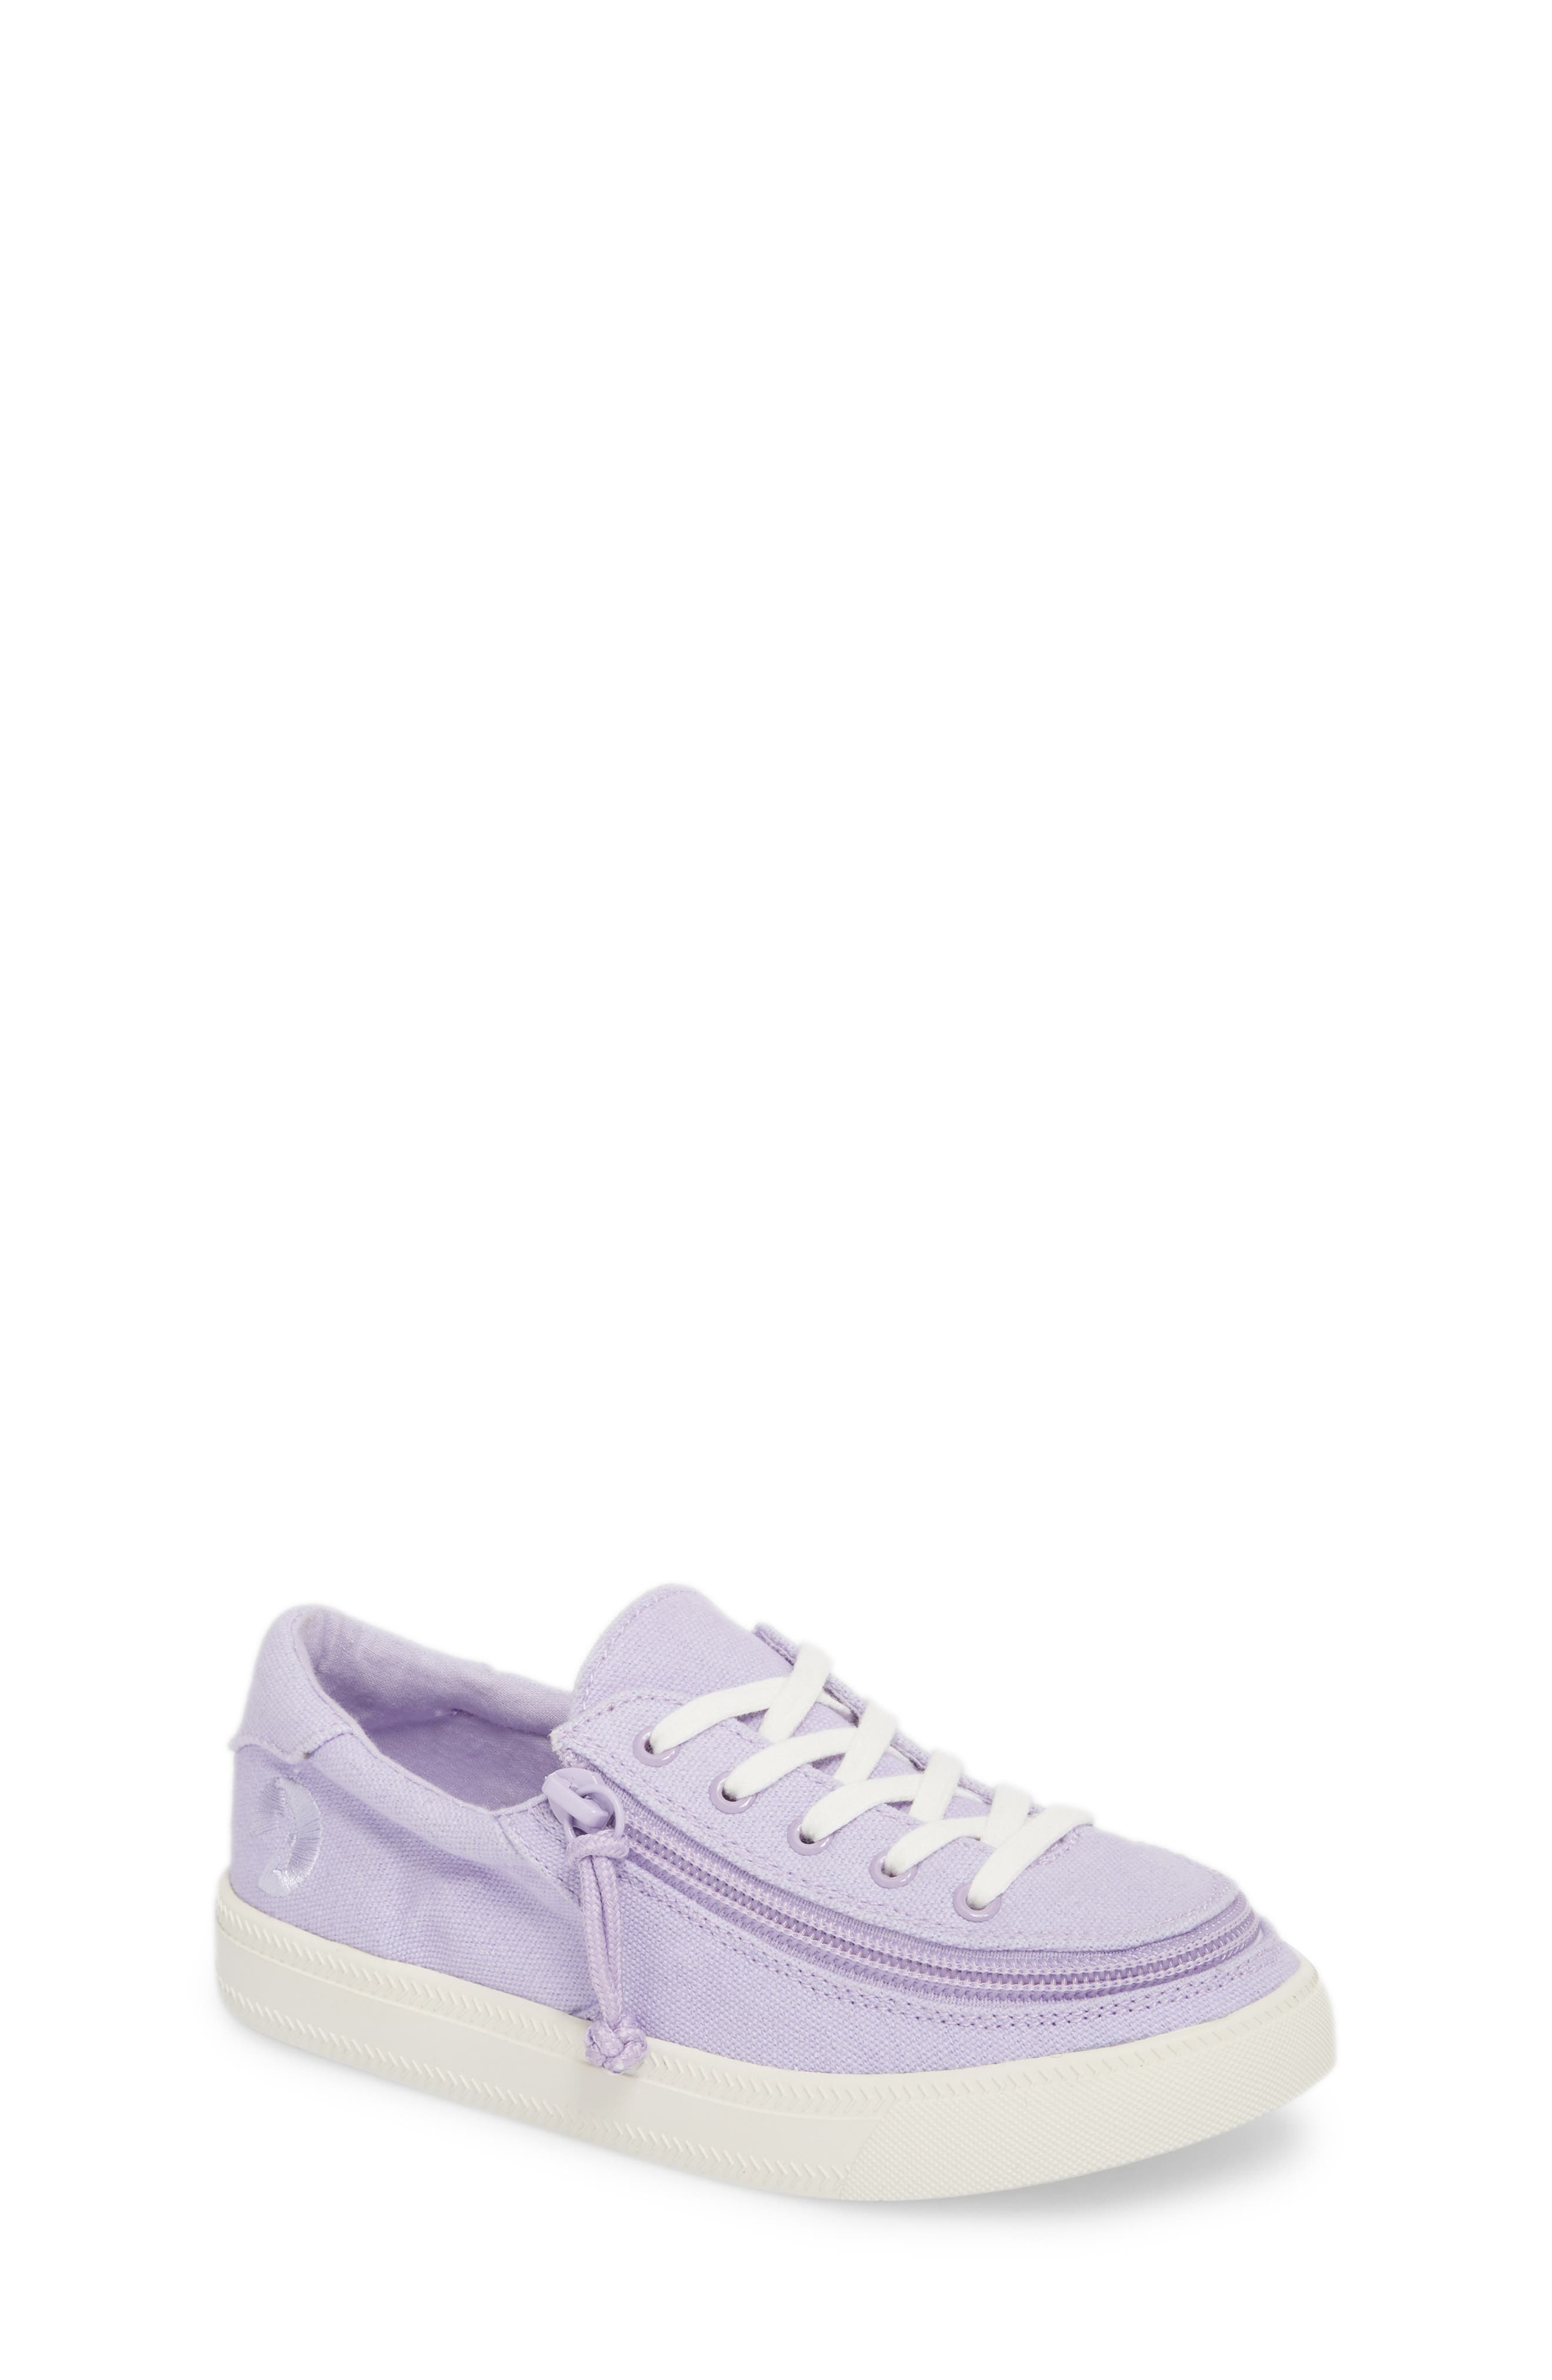 BILLY FOOTWEAR, Classic Zip Around Low Top Sneaker, Main thumbnail 1, color, LAVENDER